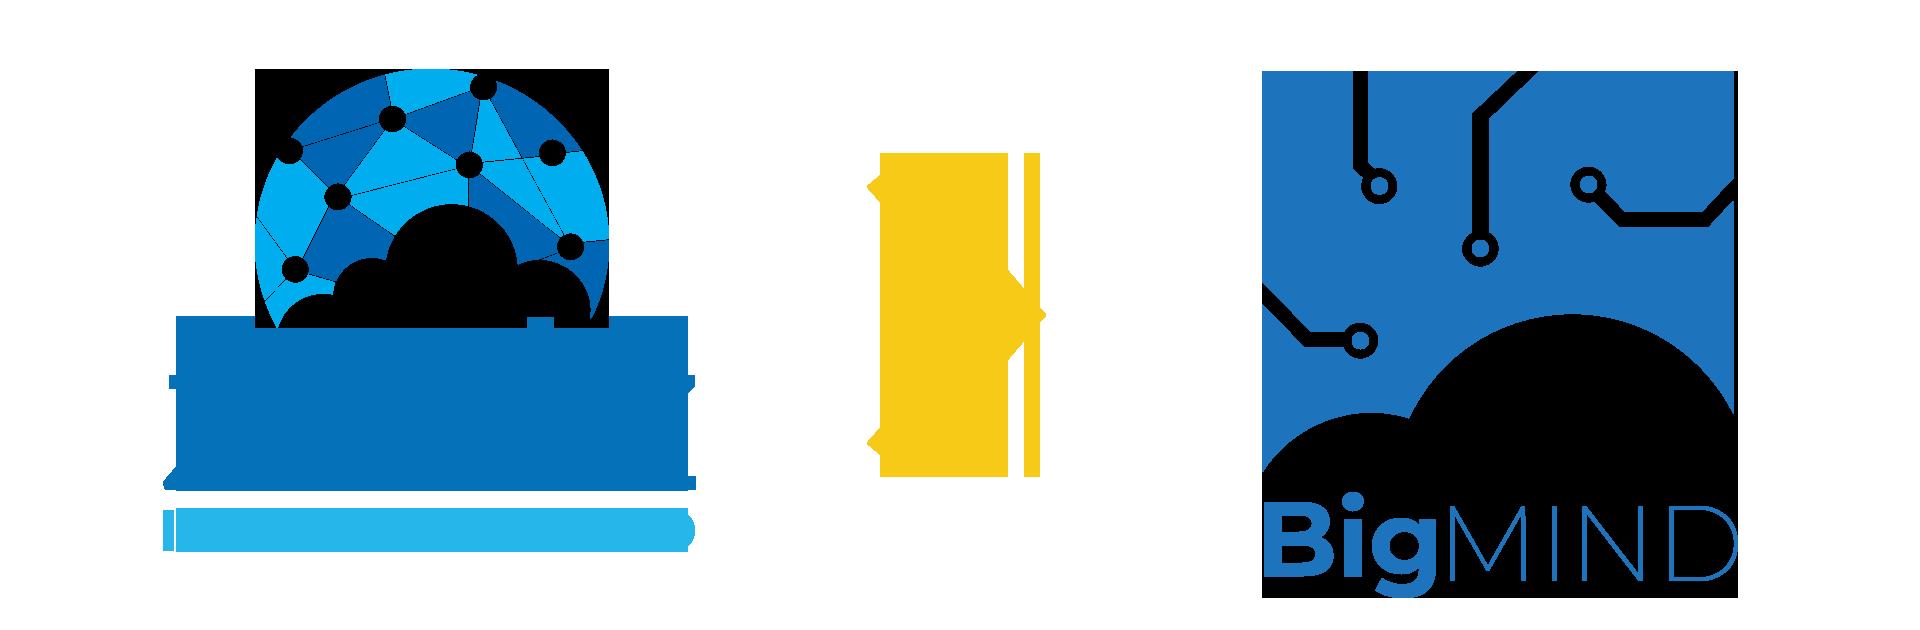 zoolz rebranded to bigmind